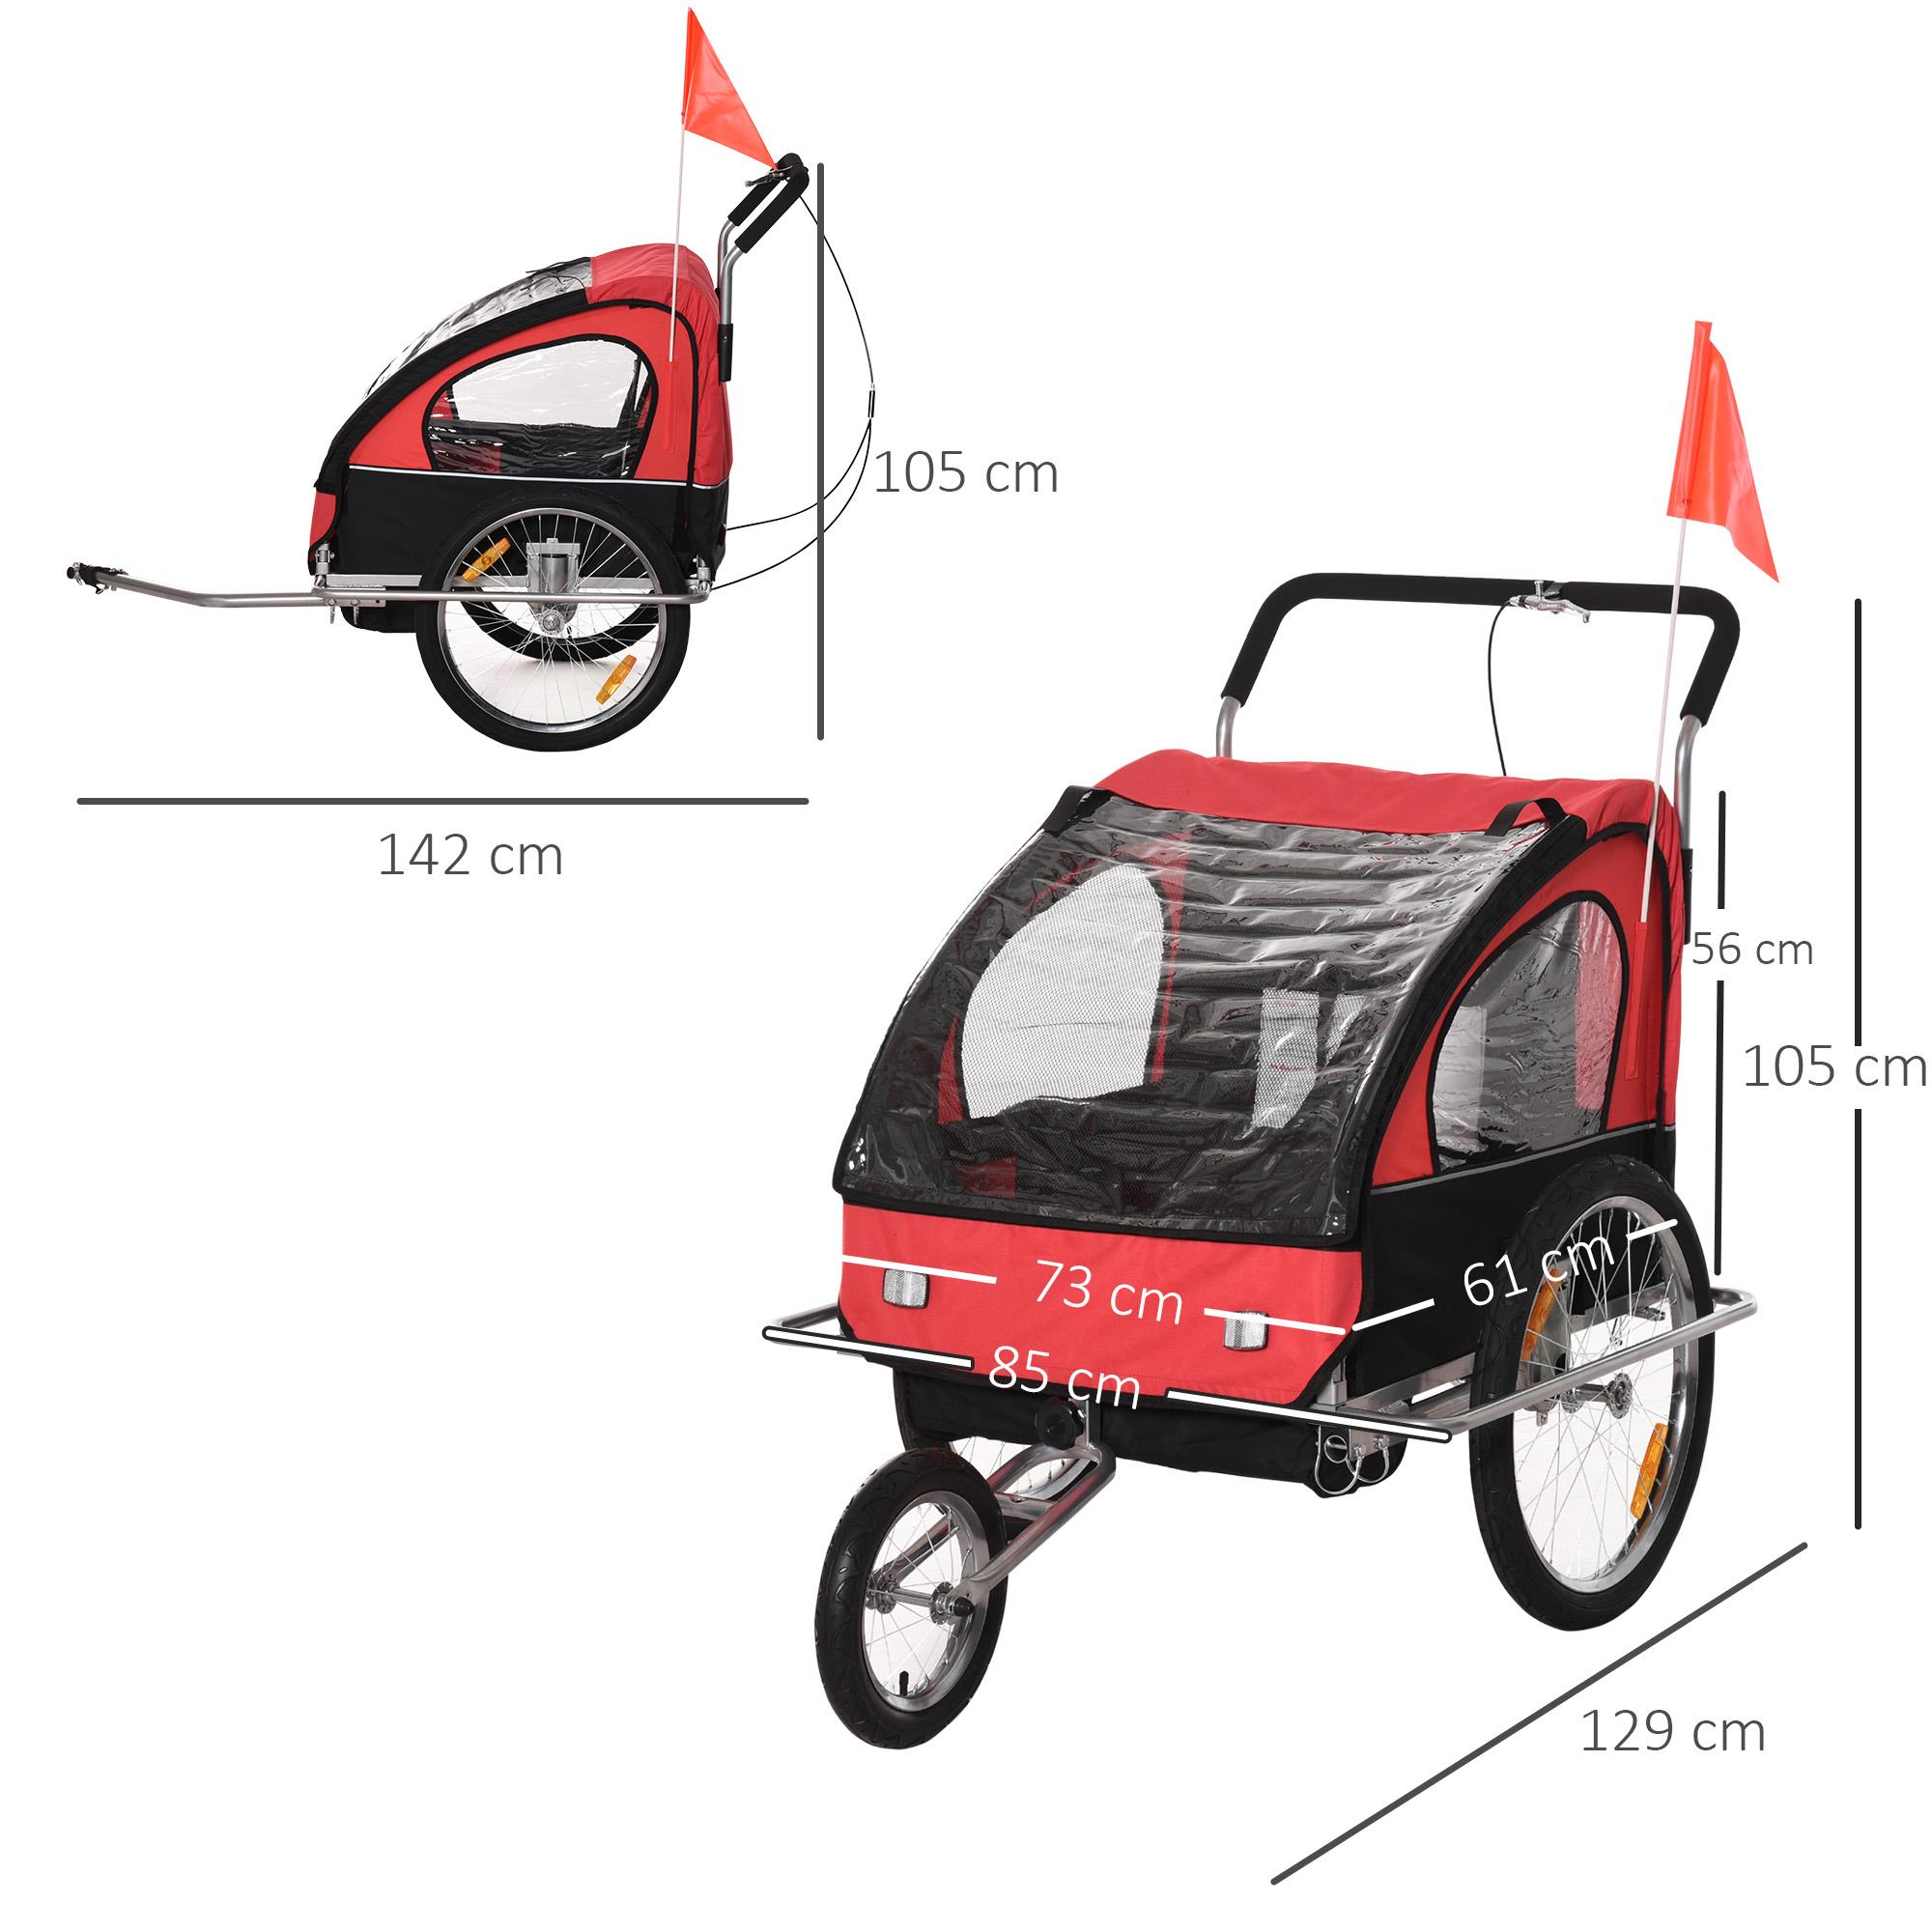 miniatura 36 - Remolque Bicicleta Niño 2 PLAZAS+Amortiguador Kit Footing Freno Bandera Cubierta